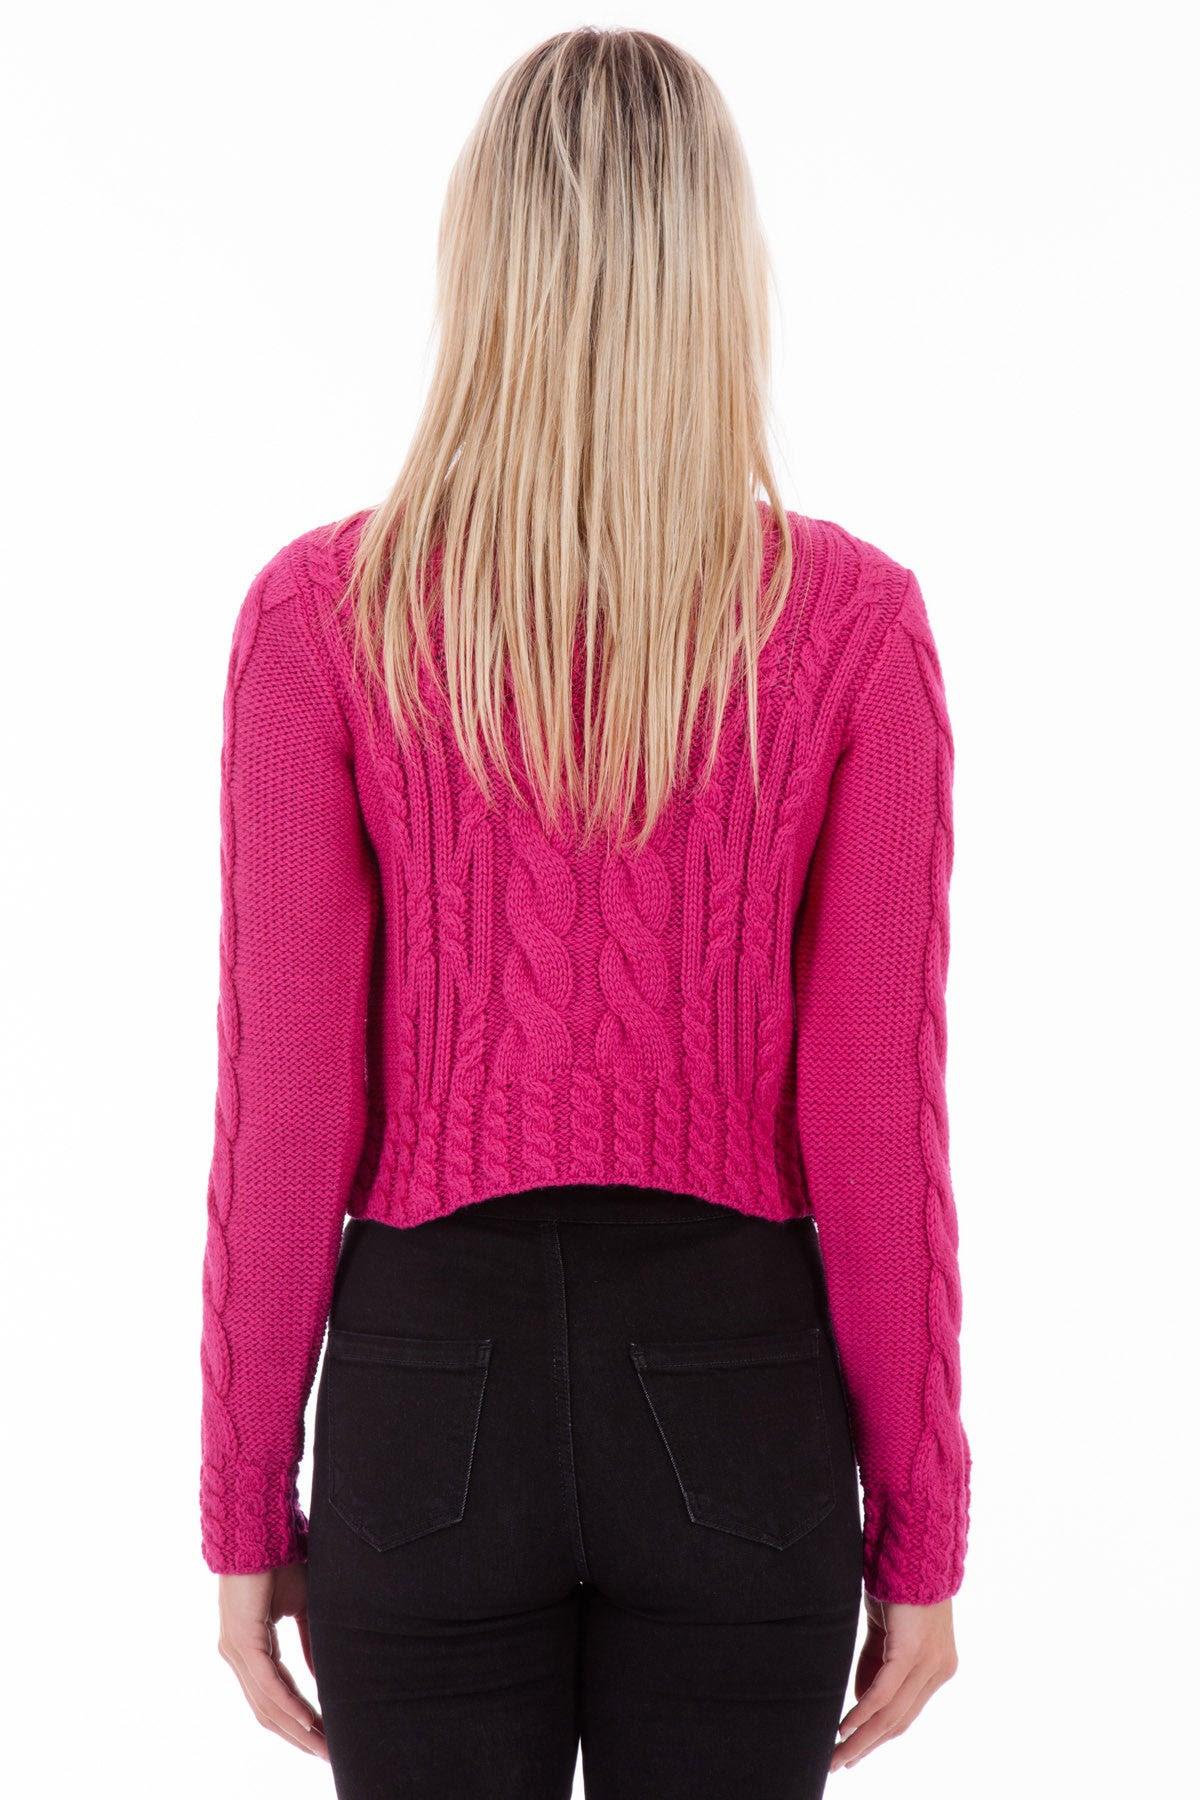 vintage aran  hot pink womens aran jumper wool sweater